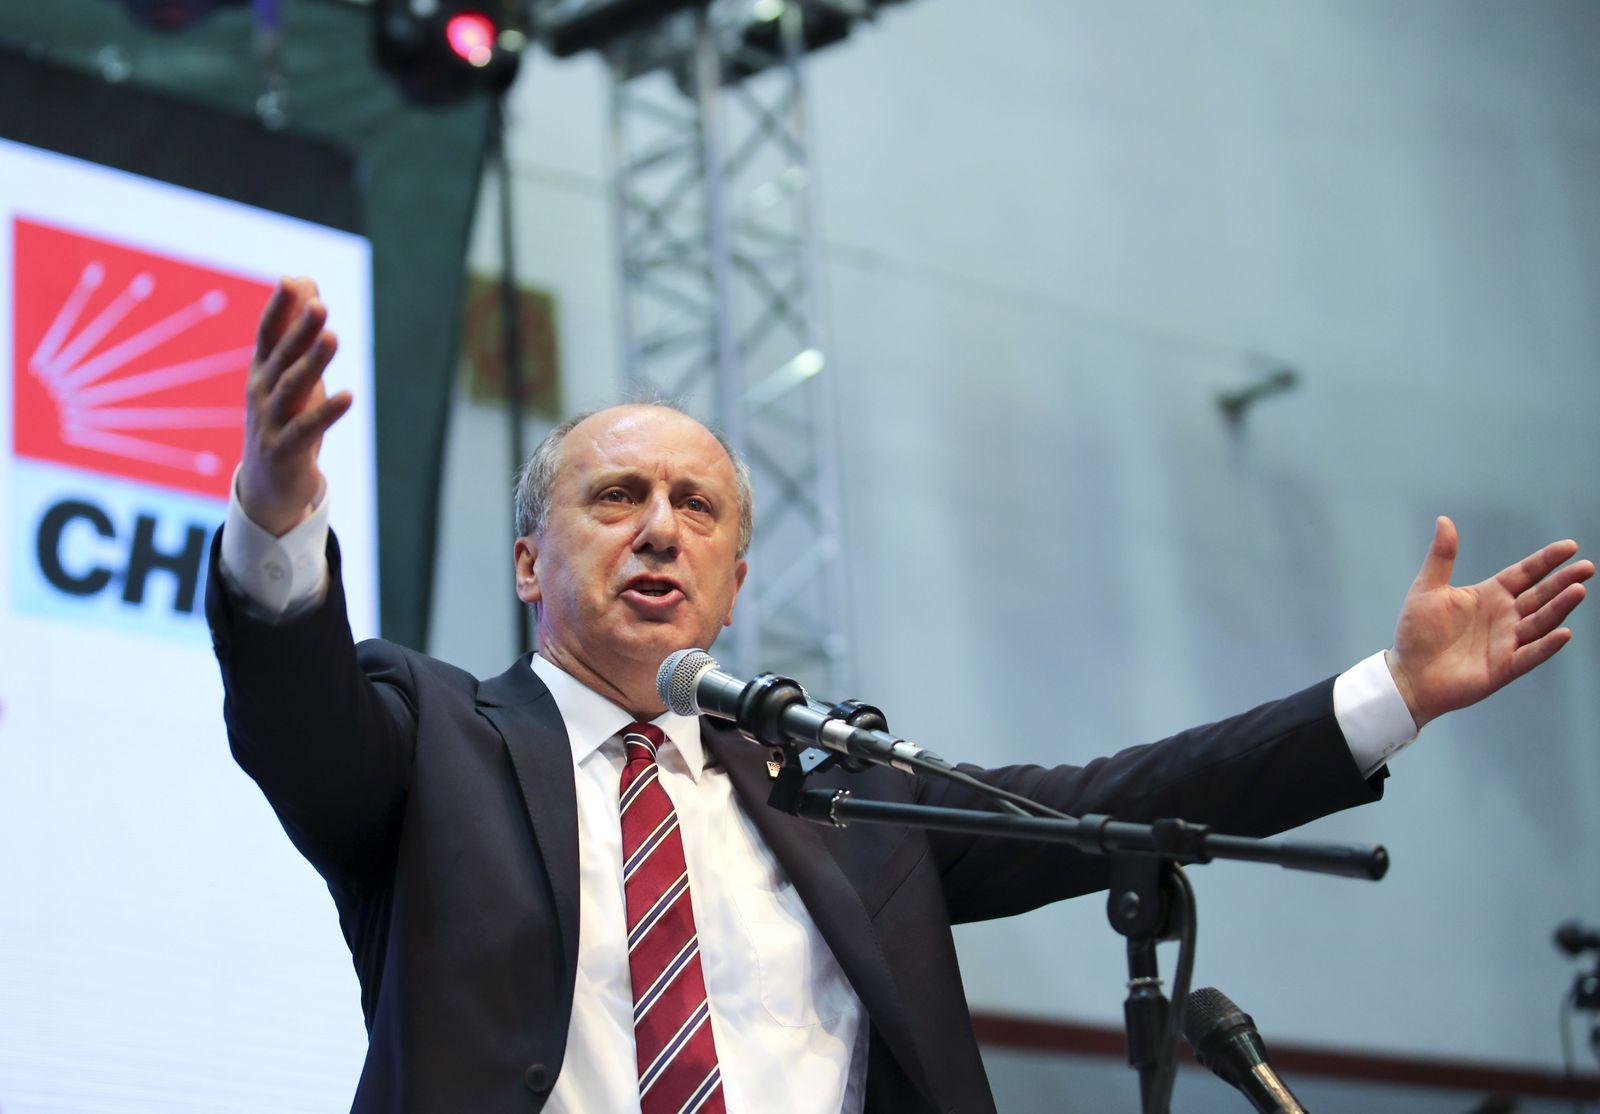 TURKEY-ELECTION/CHP